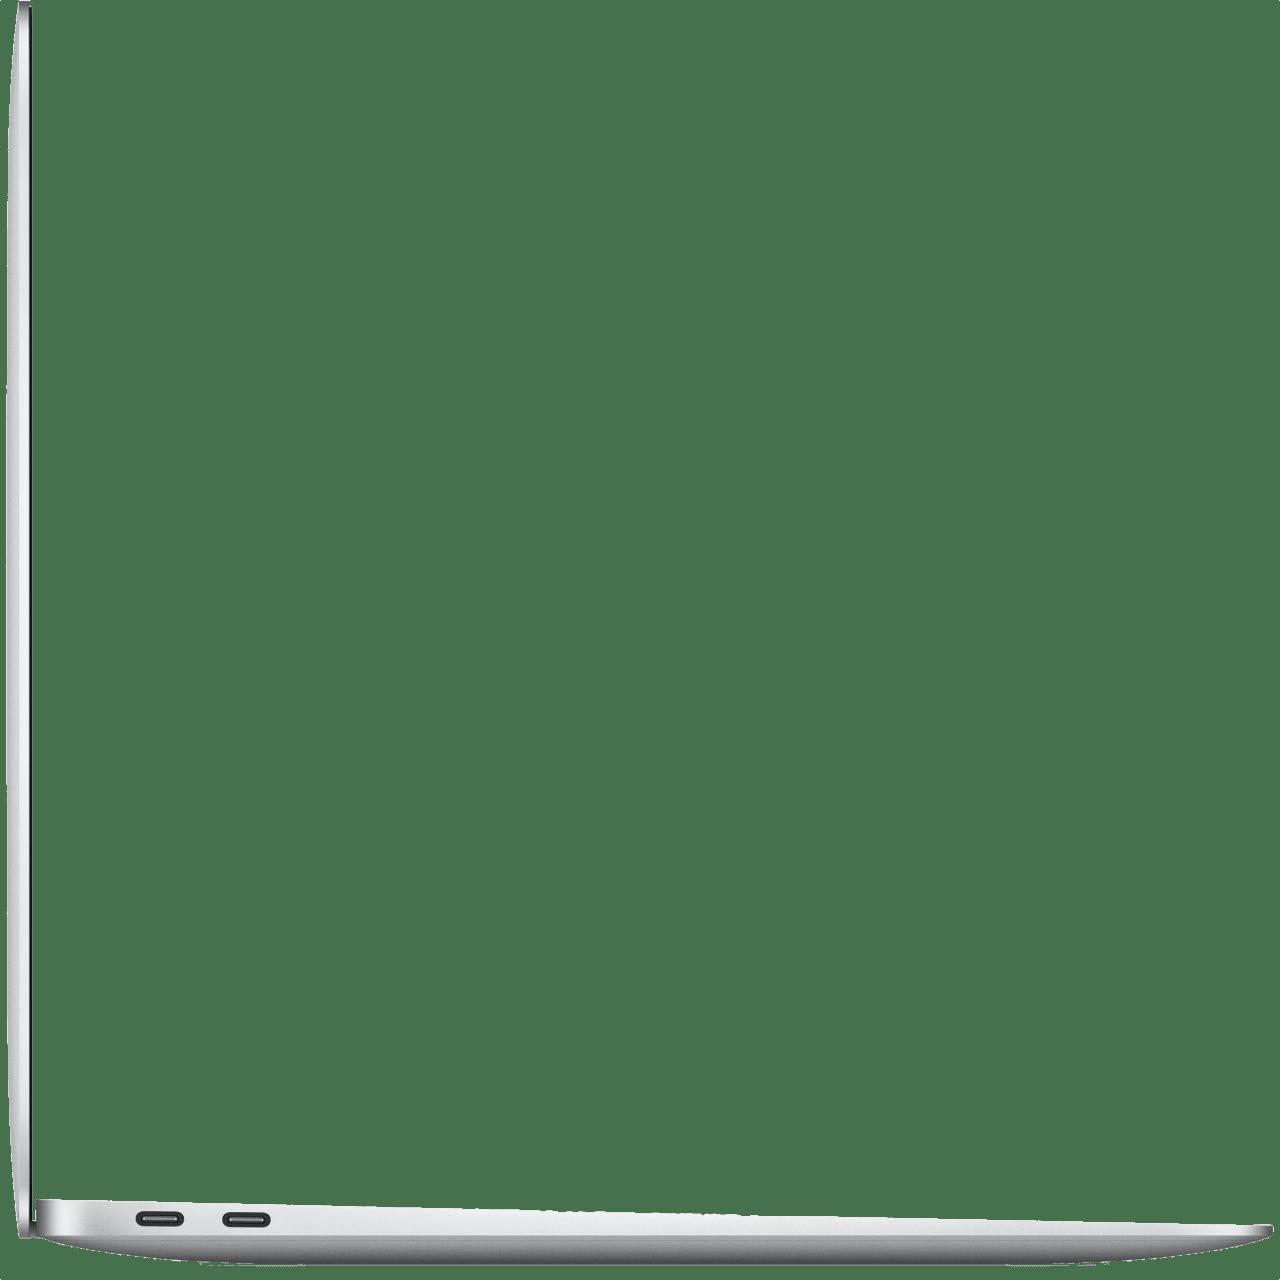 Silver Apple MacBook Air (Late 2020) Laptop - Apple M1 - 8GB - 512GB SSD - Apple Integrated 8-core GPU.3